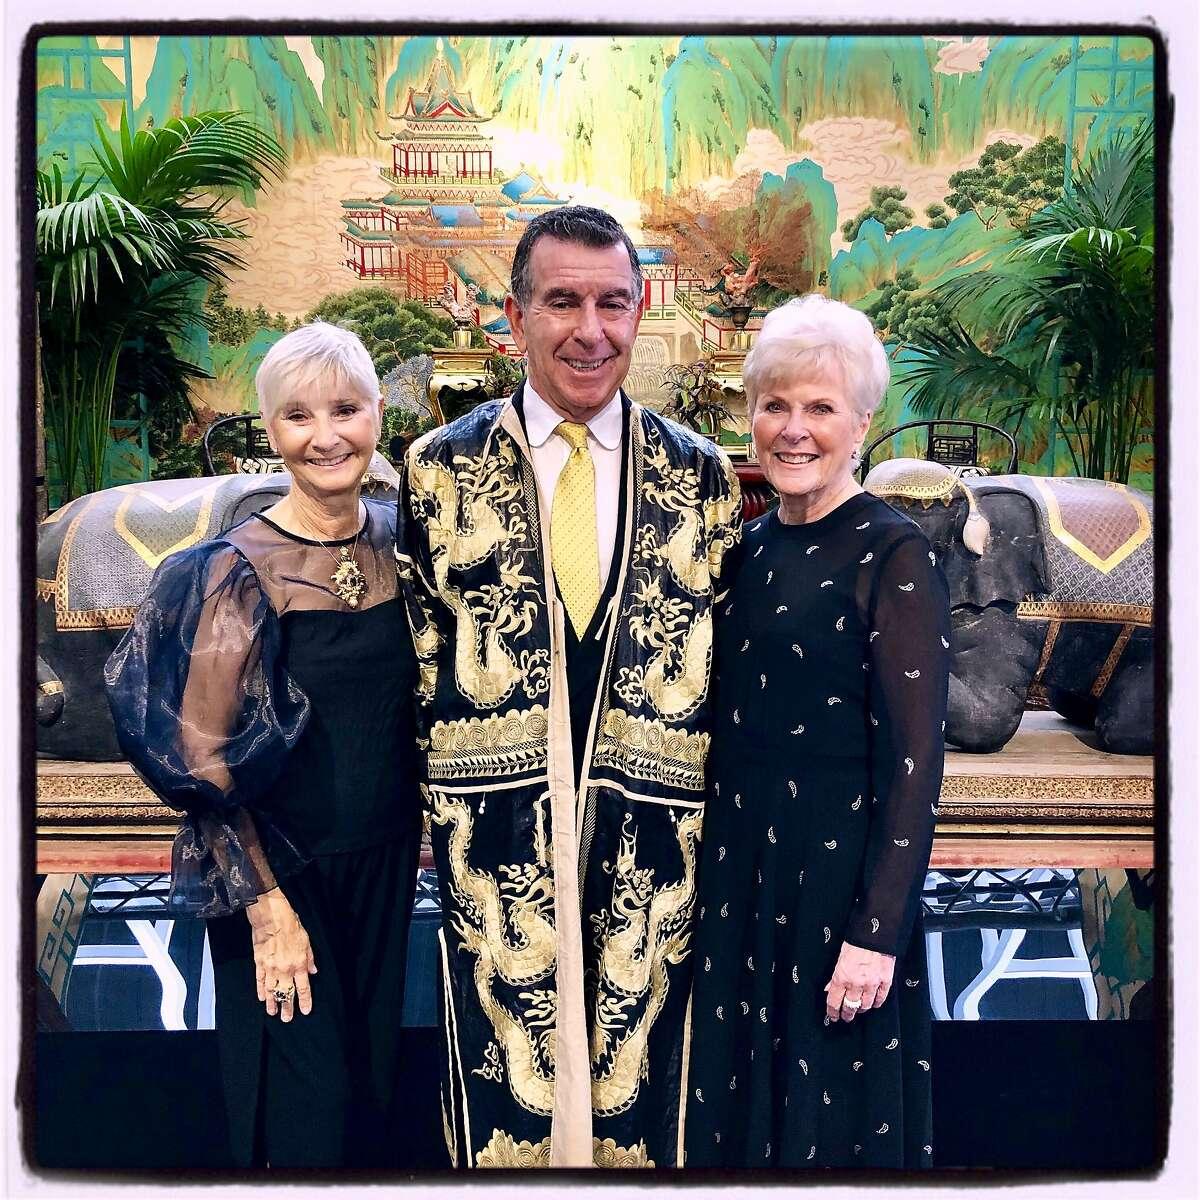 Gail Glasser (left) with designer Hutton Wilkinson and